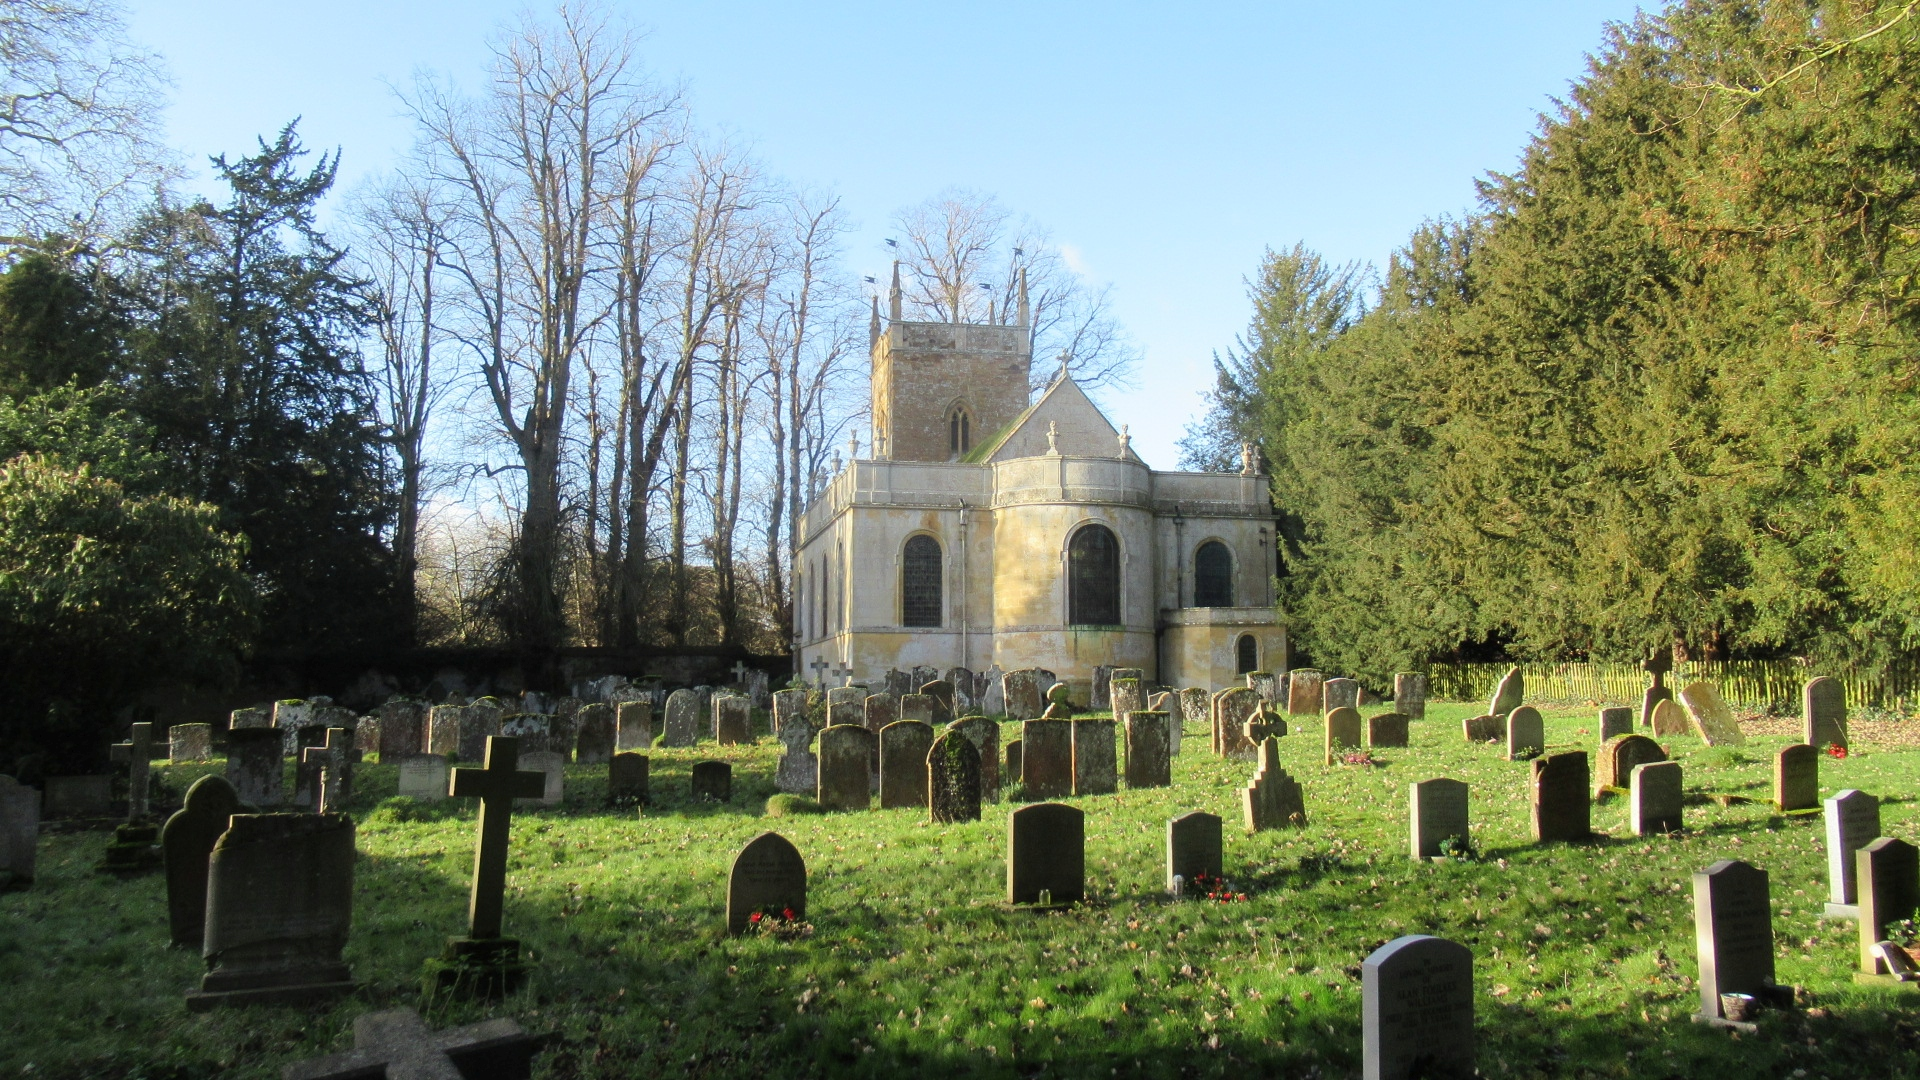 Honington Church Shipston-on-Stour Warwickshire